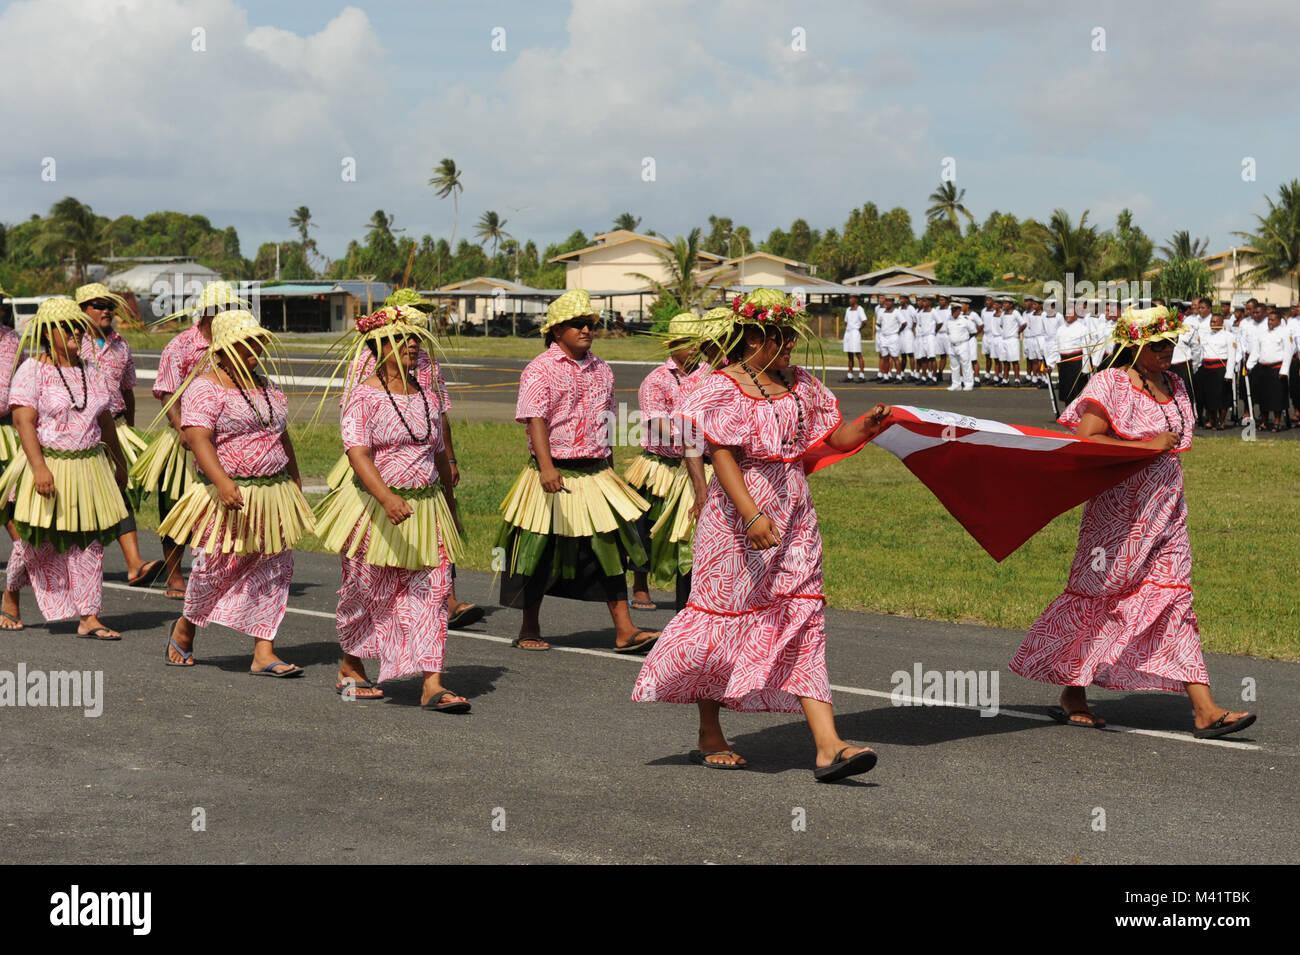 Tuvaluans parade through Funafuti during annual Independance Day celebrations - Stock Image